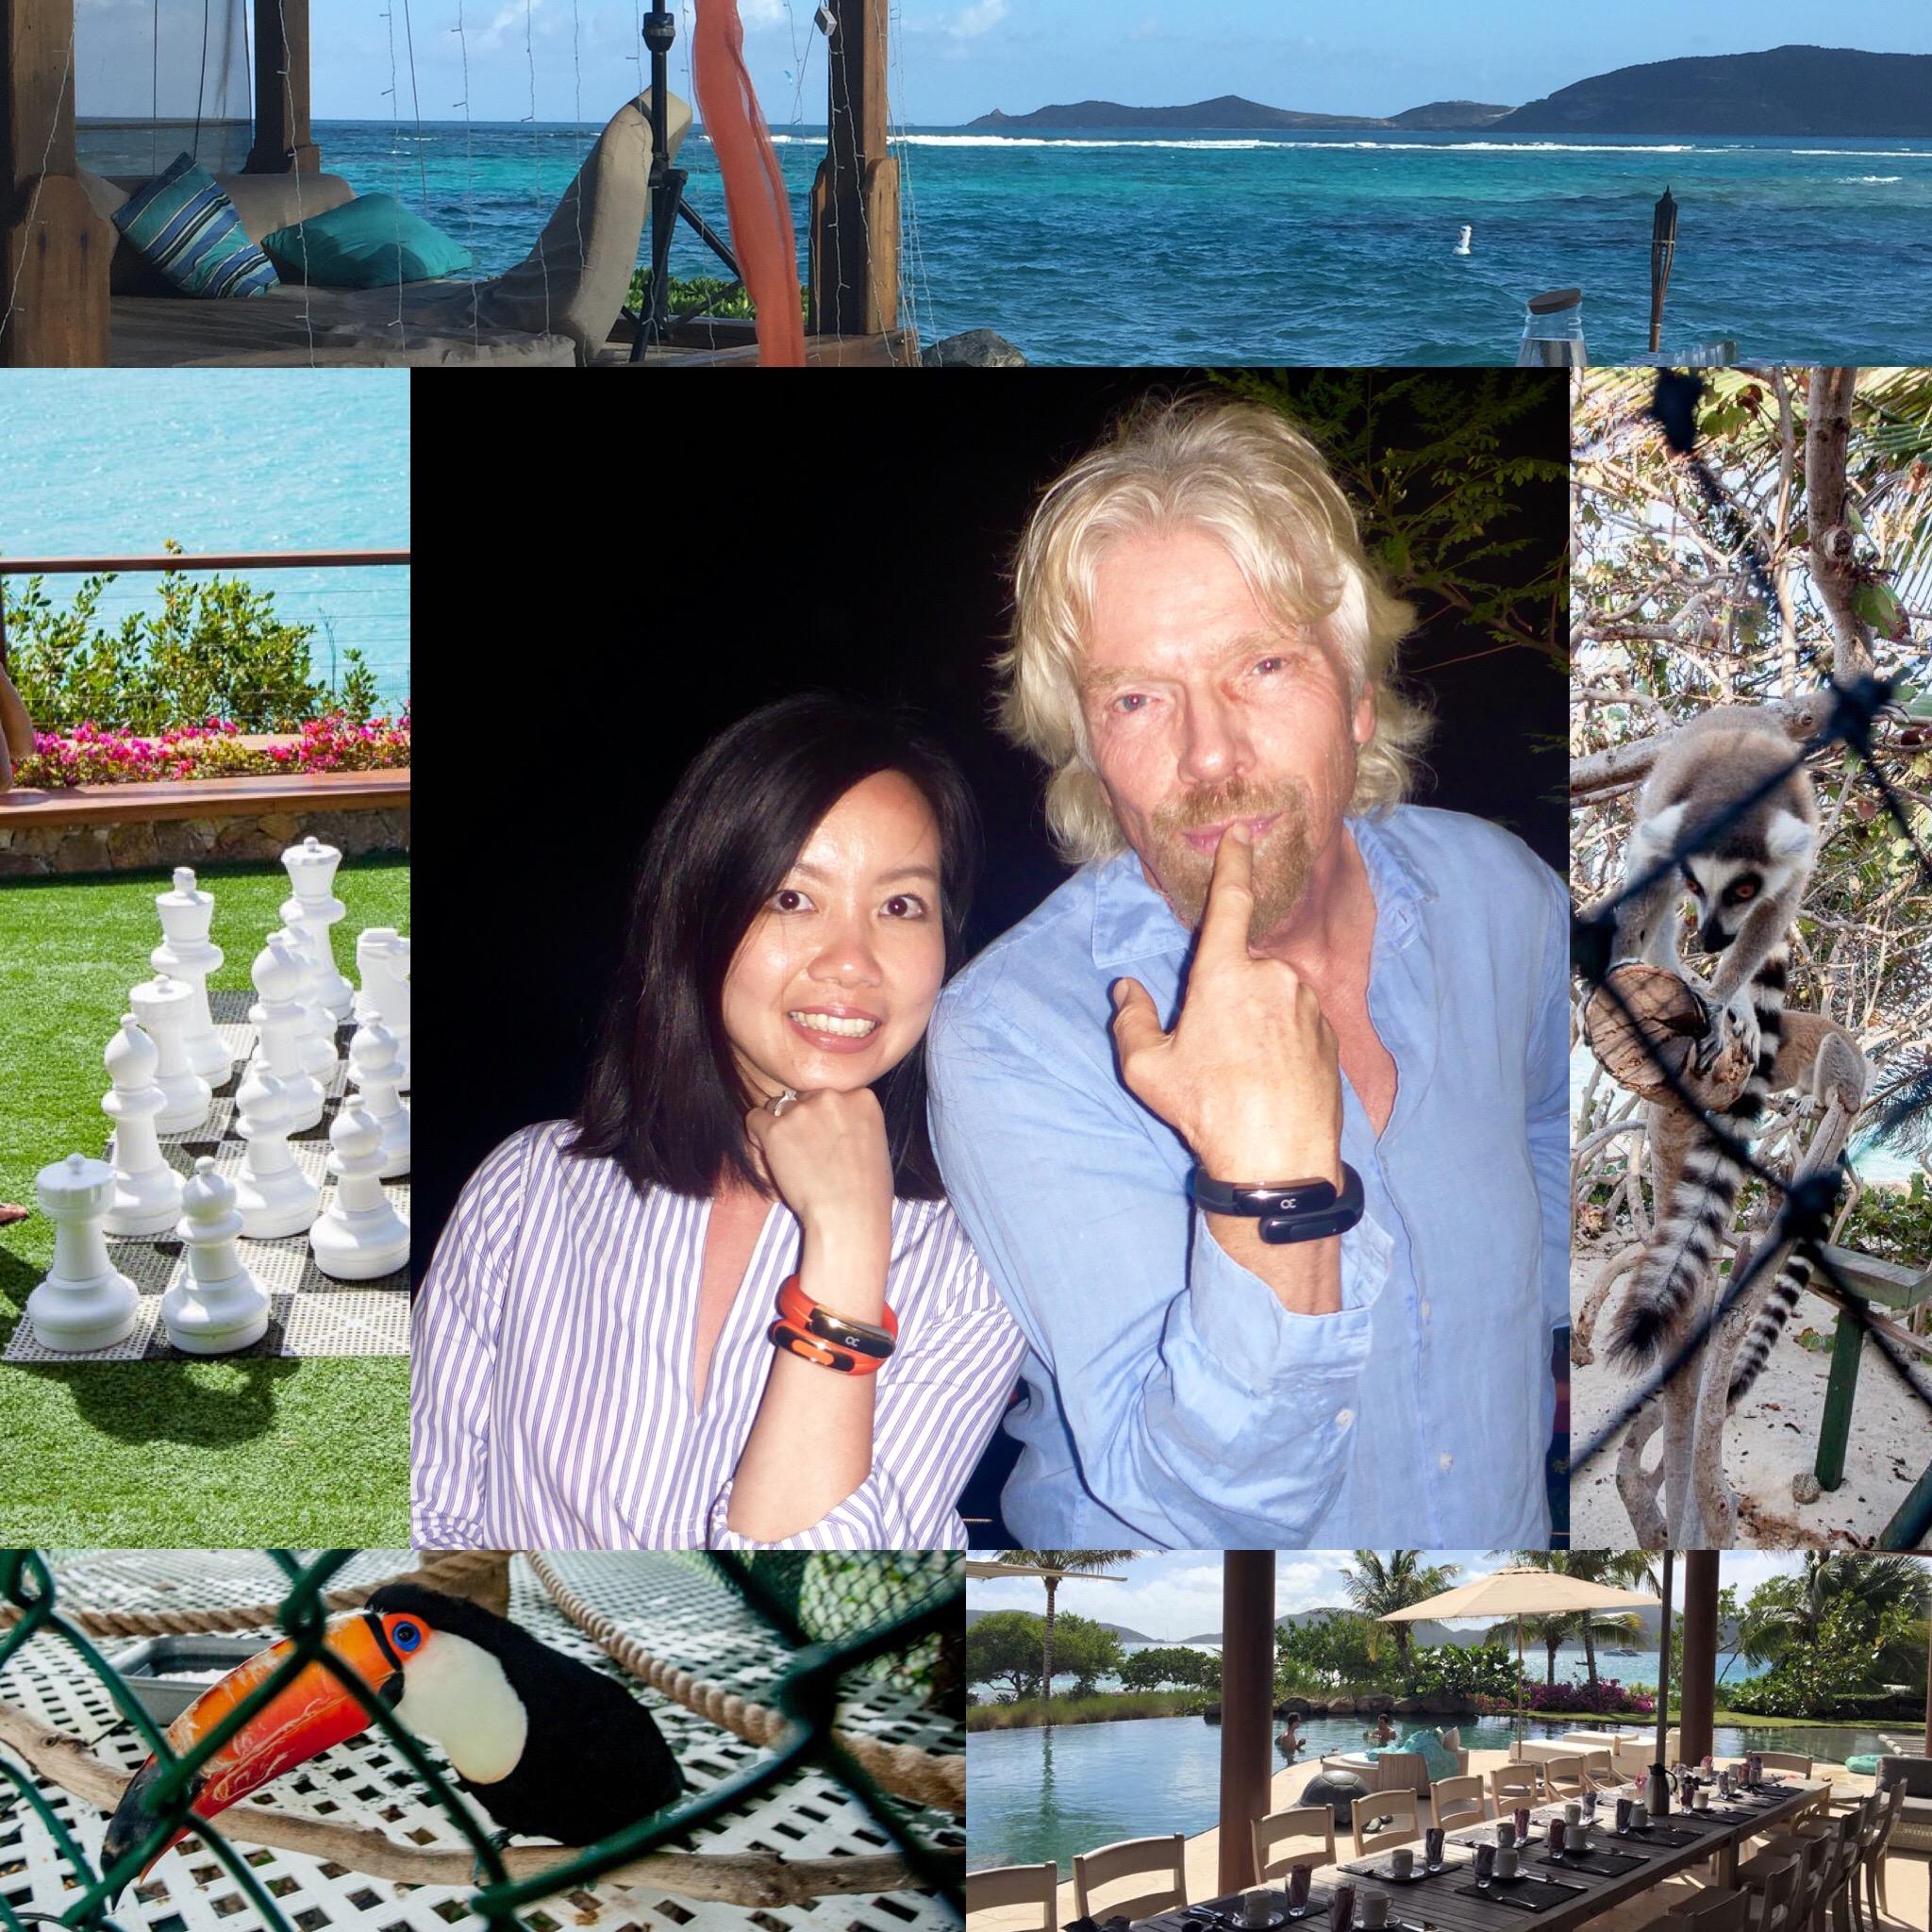 Ashley Chloe's CEO, Angela Pan, with Sir Richard Branson on Necker Island